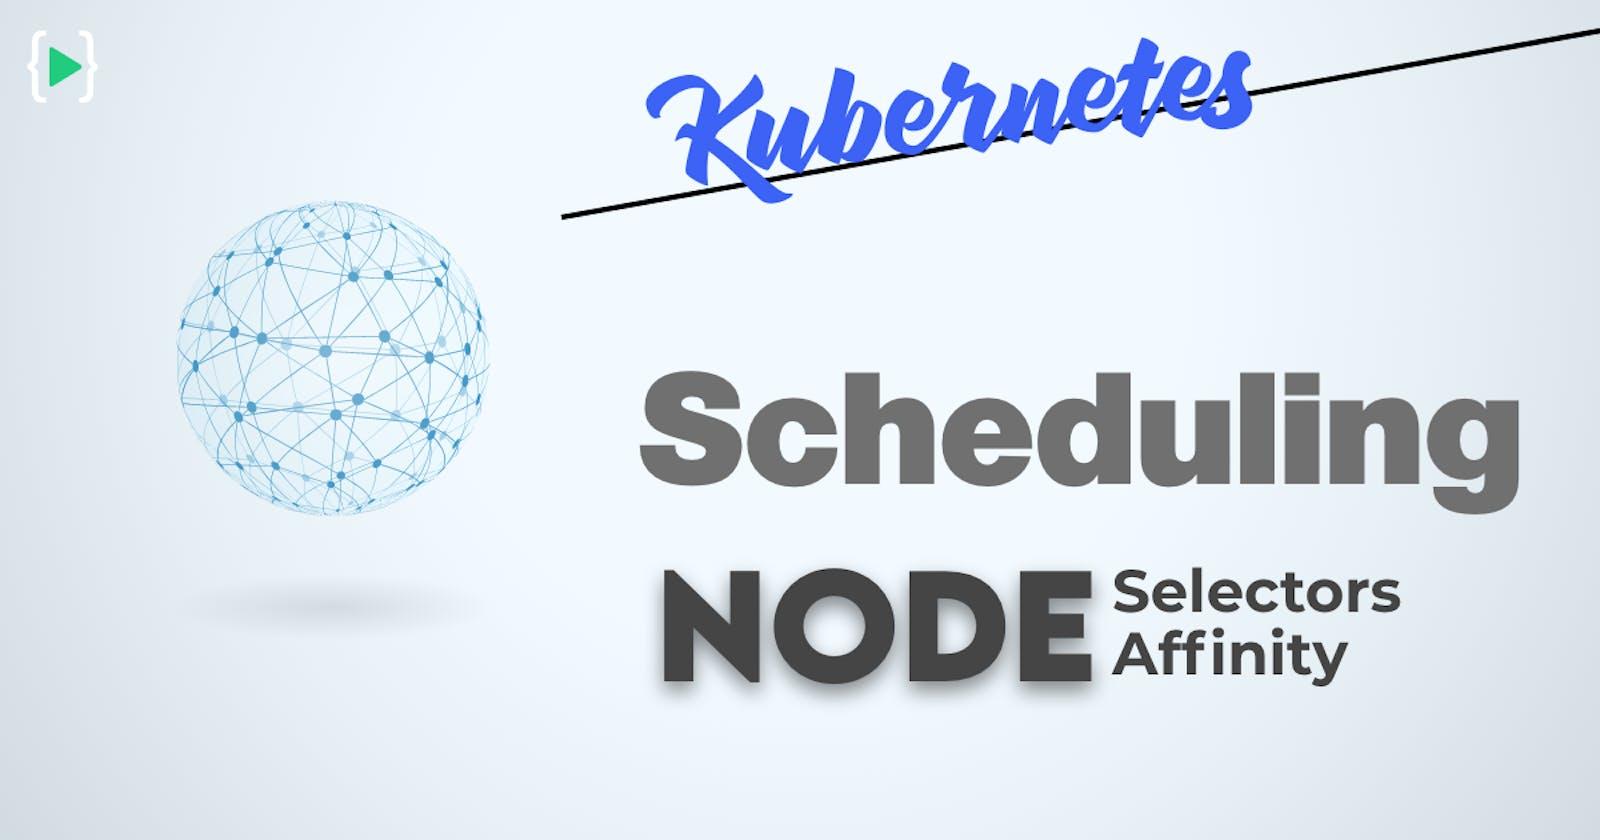 Kubernetes Scheduling - Node Selectors and Node Affinity